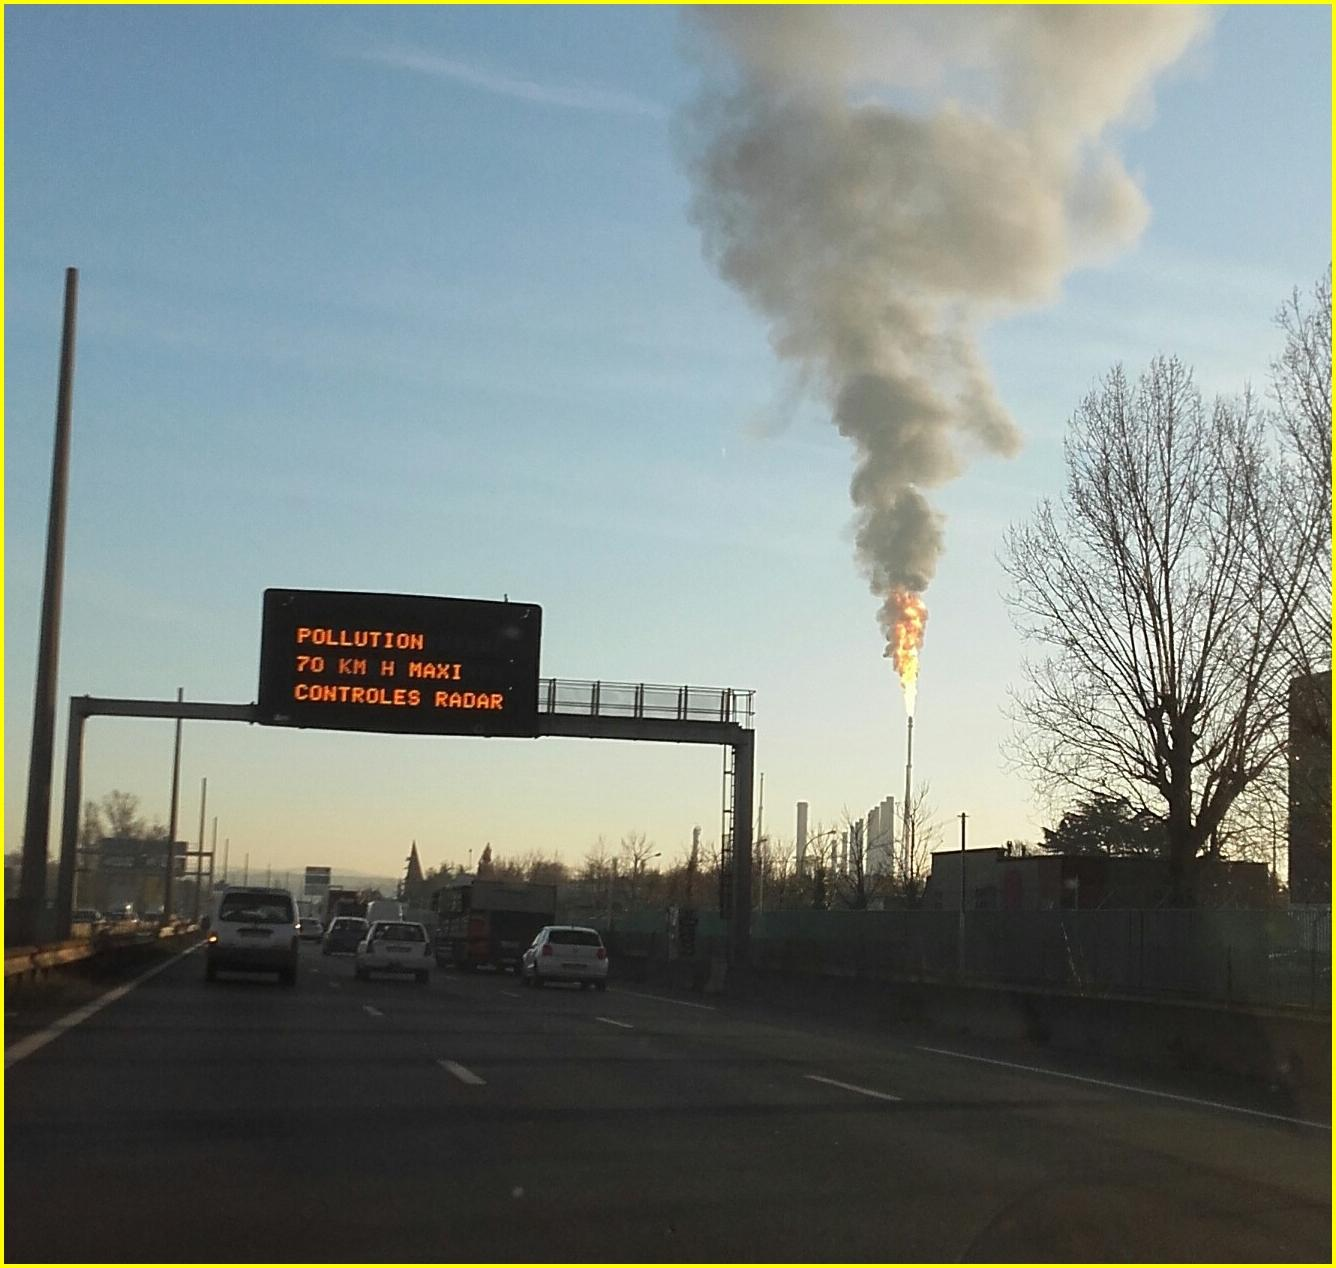 Pollution circulation